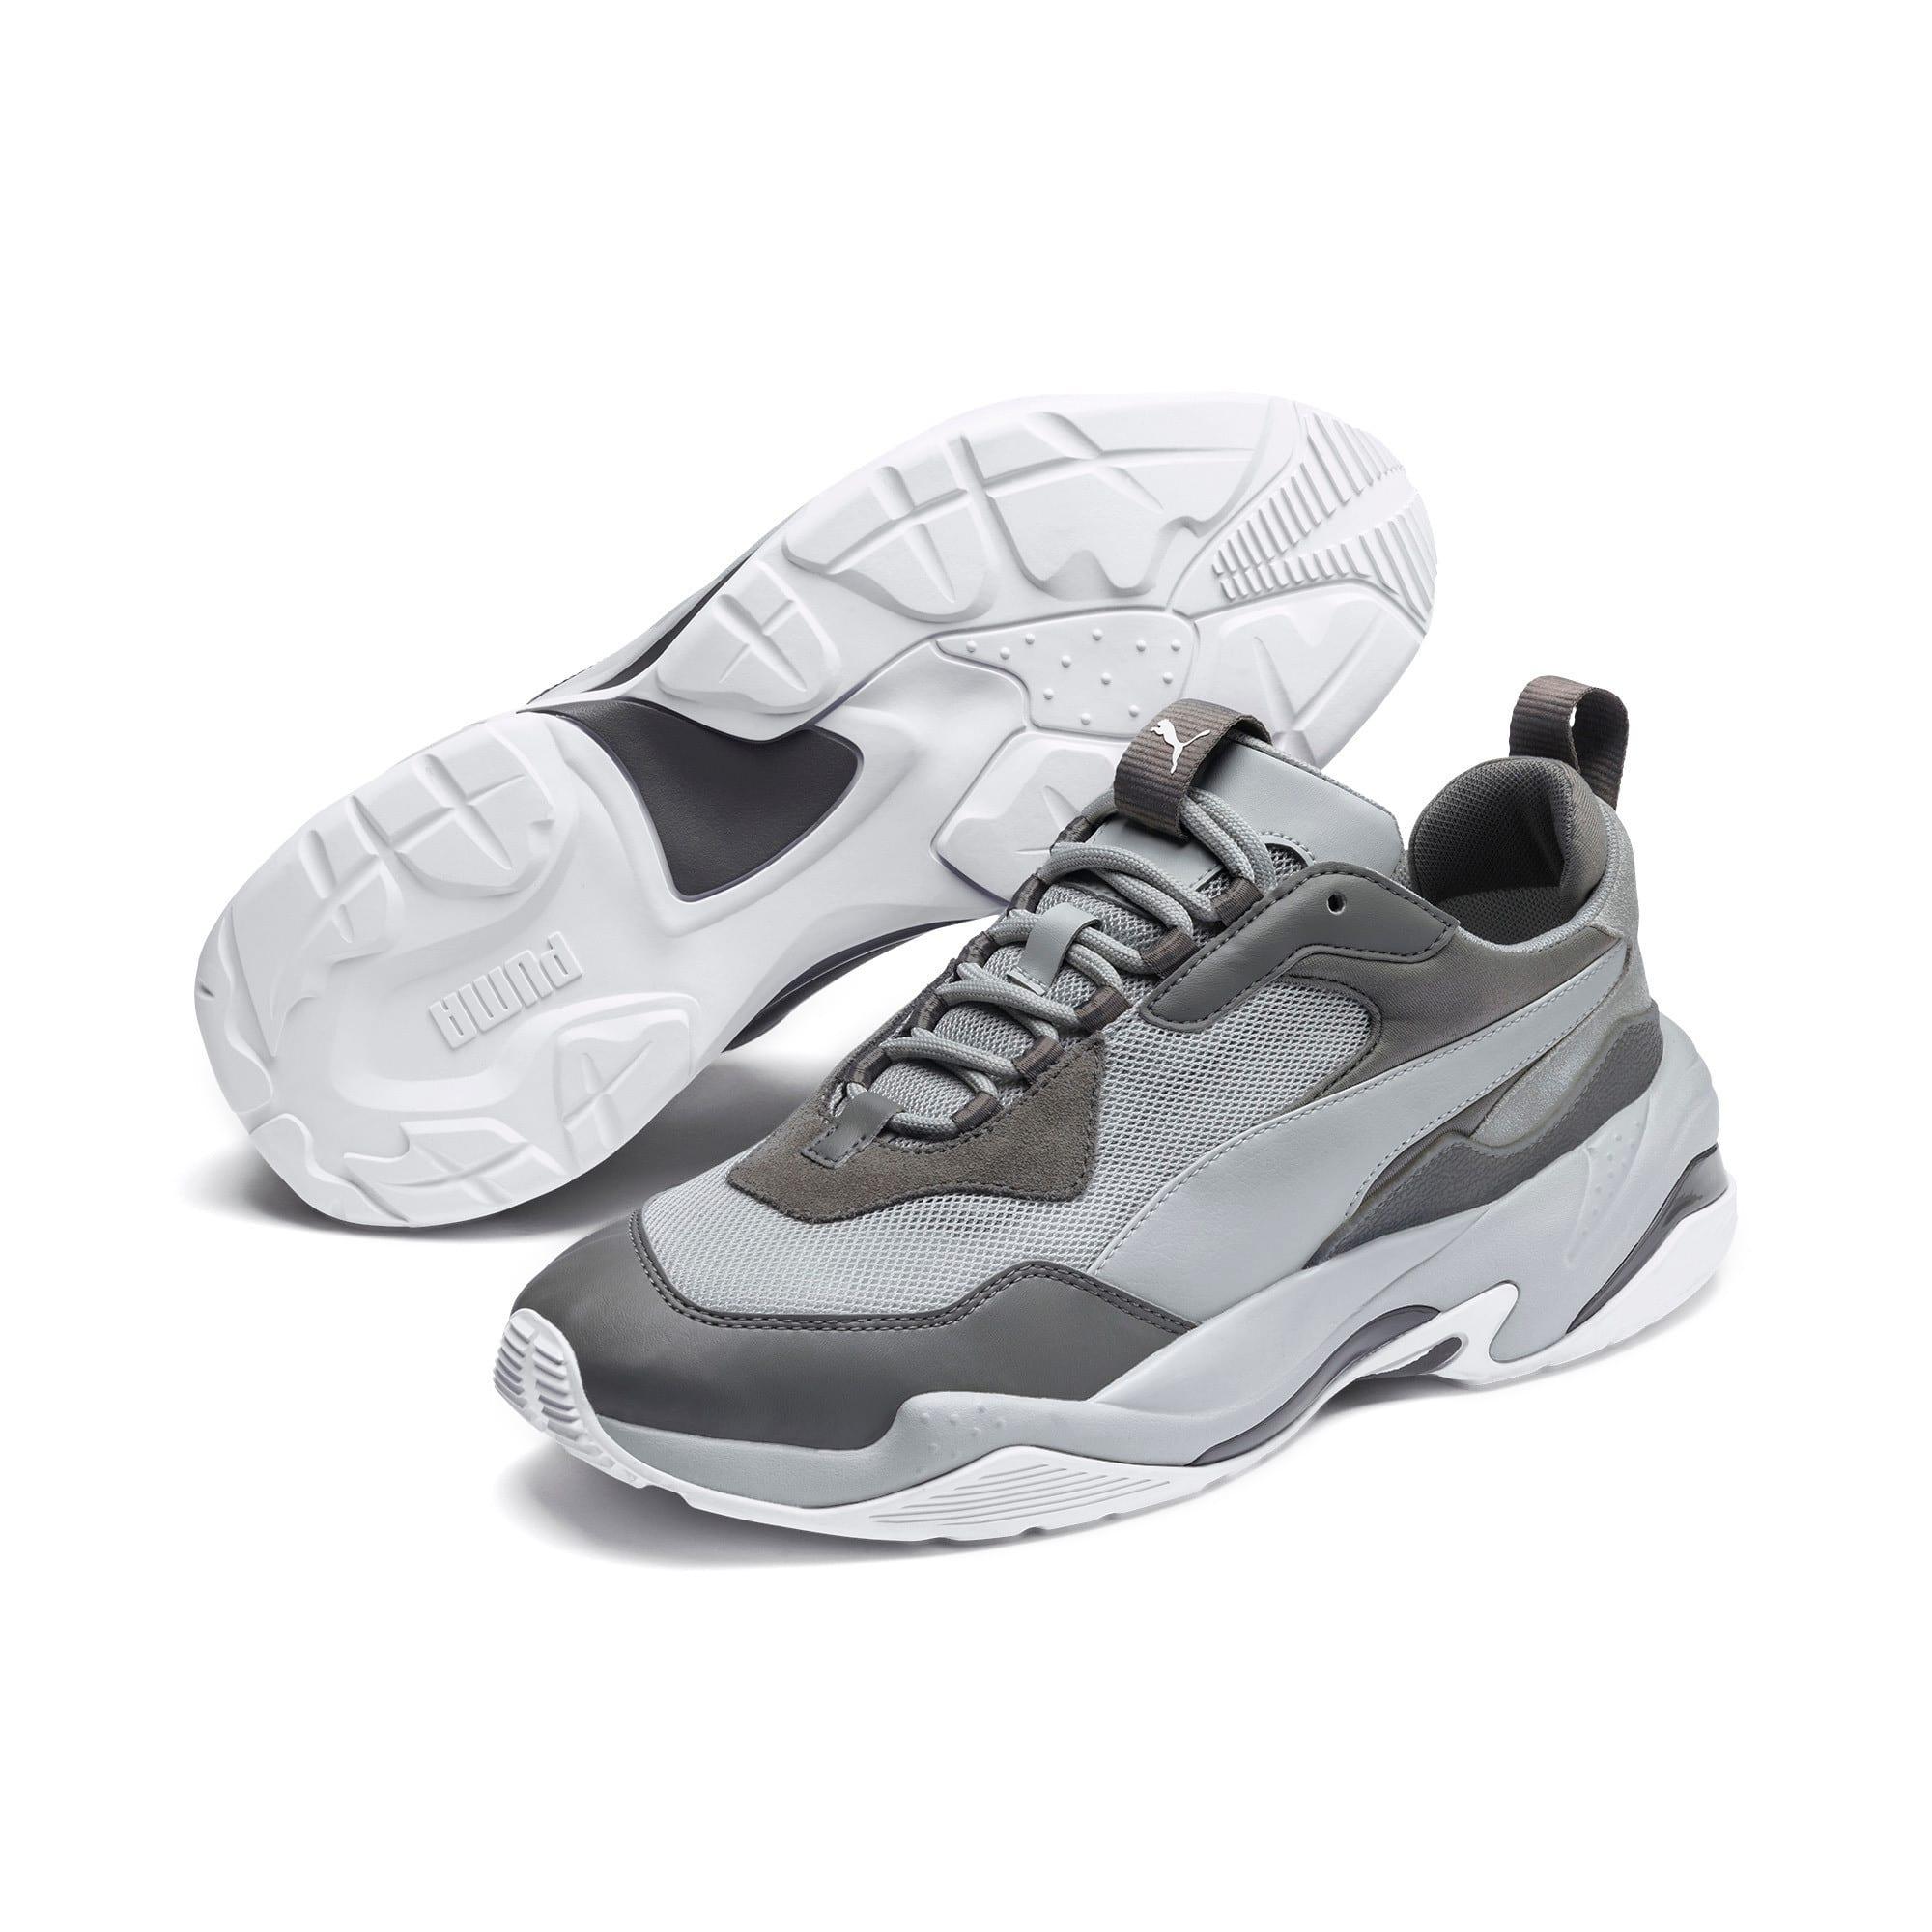 Thumbnail 3 of Thunder Fashion 2.0 Sneakers, High Rise-CASTLEROCK, medium